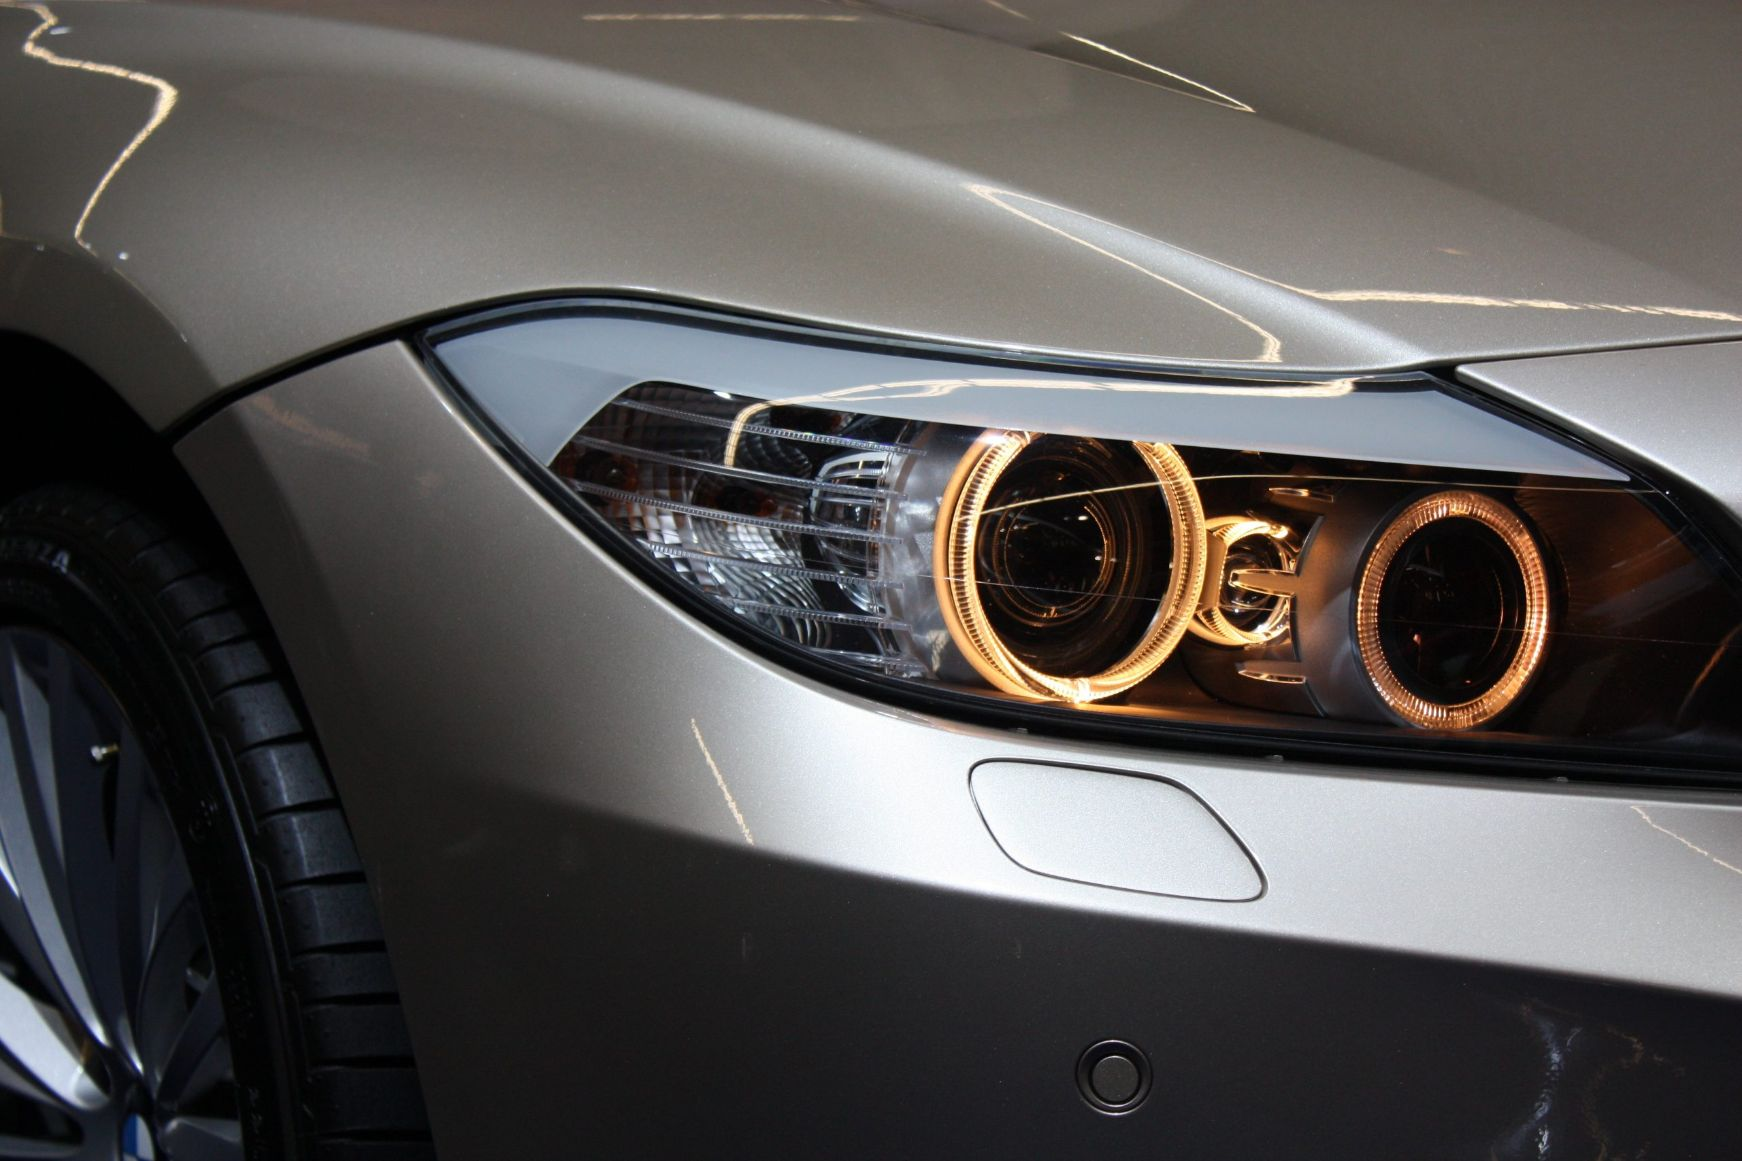 Car Lights Maintenance